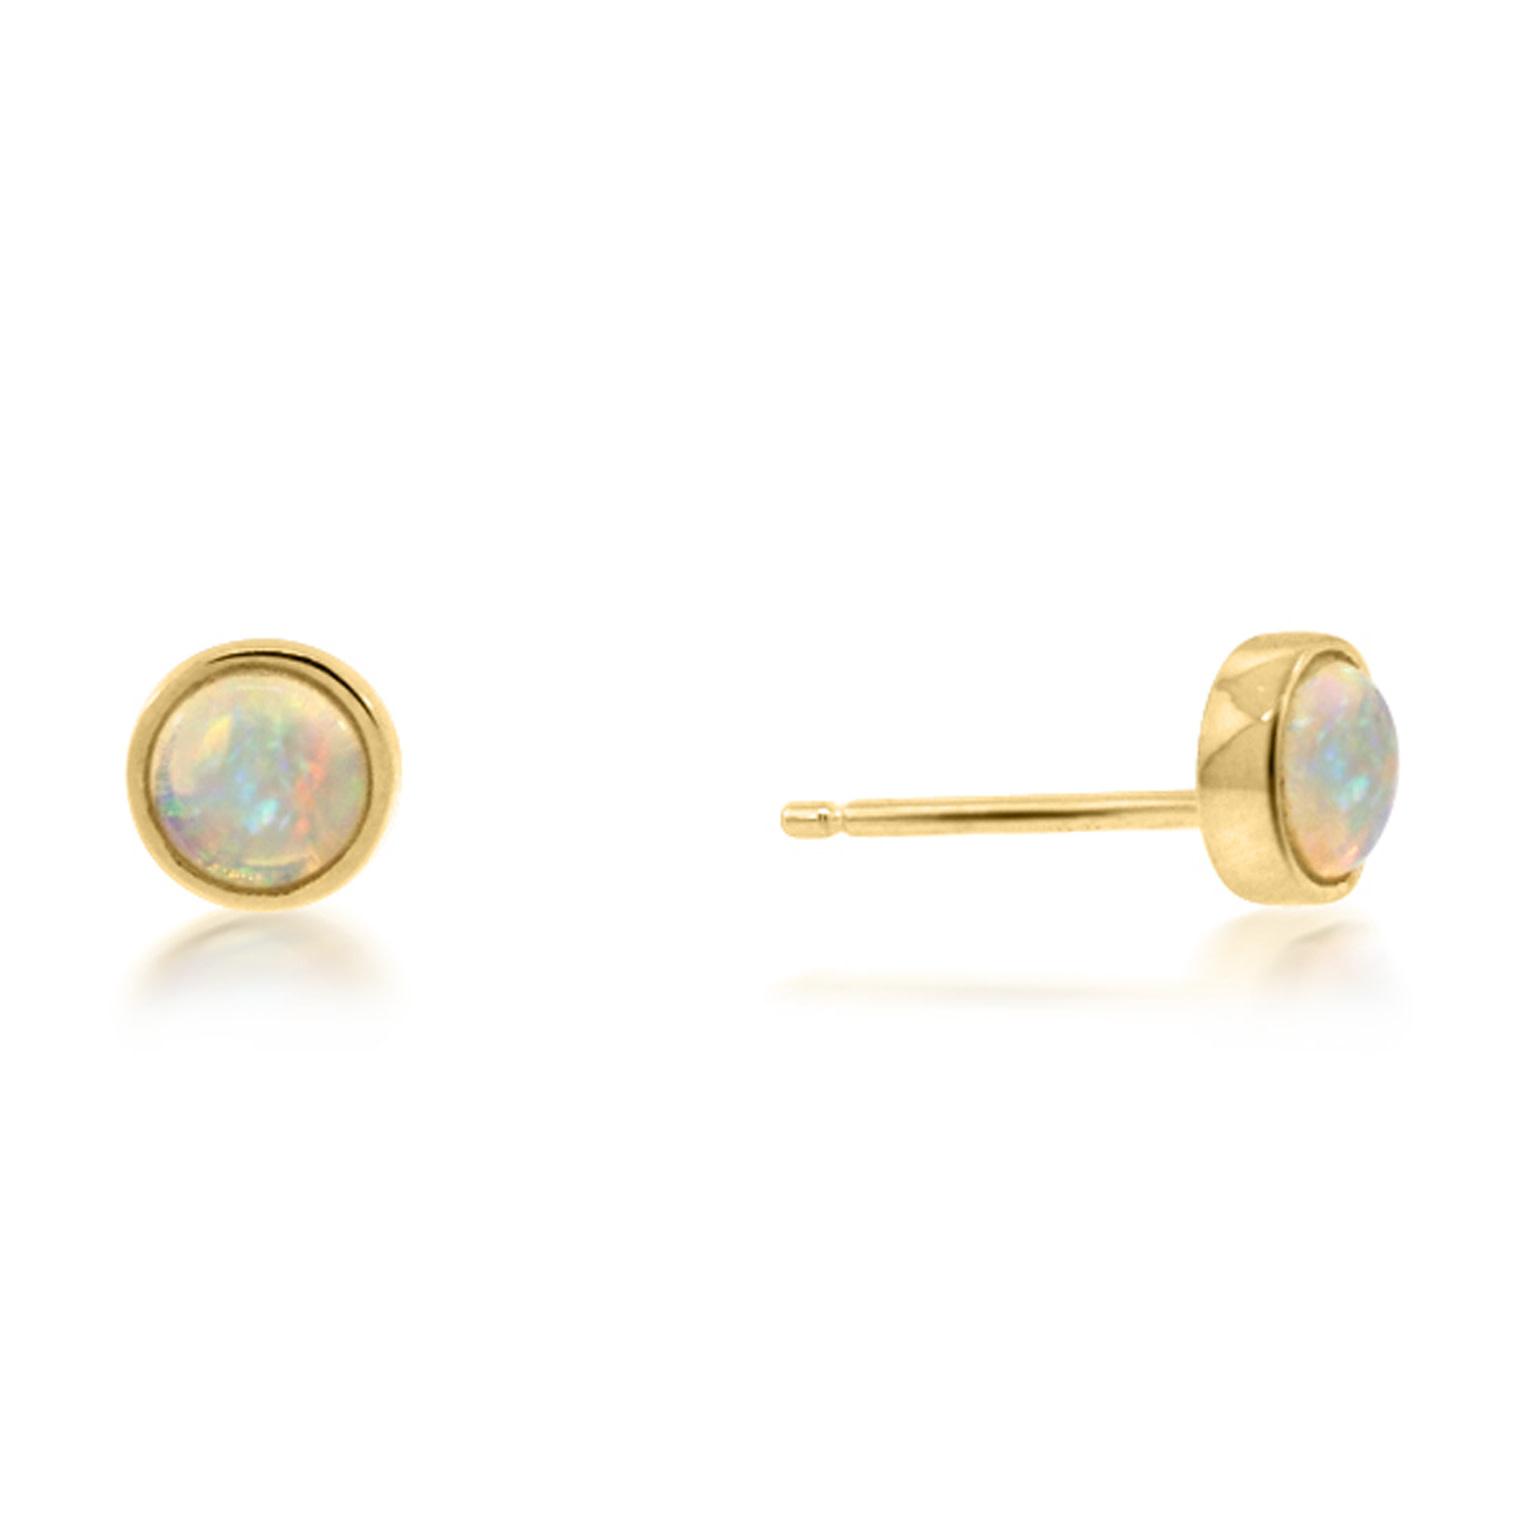 Trabert Goldsmiths Round Opal Bezel Earrings